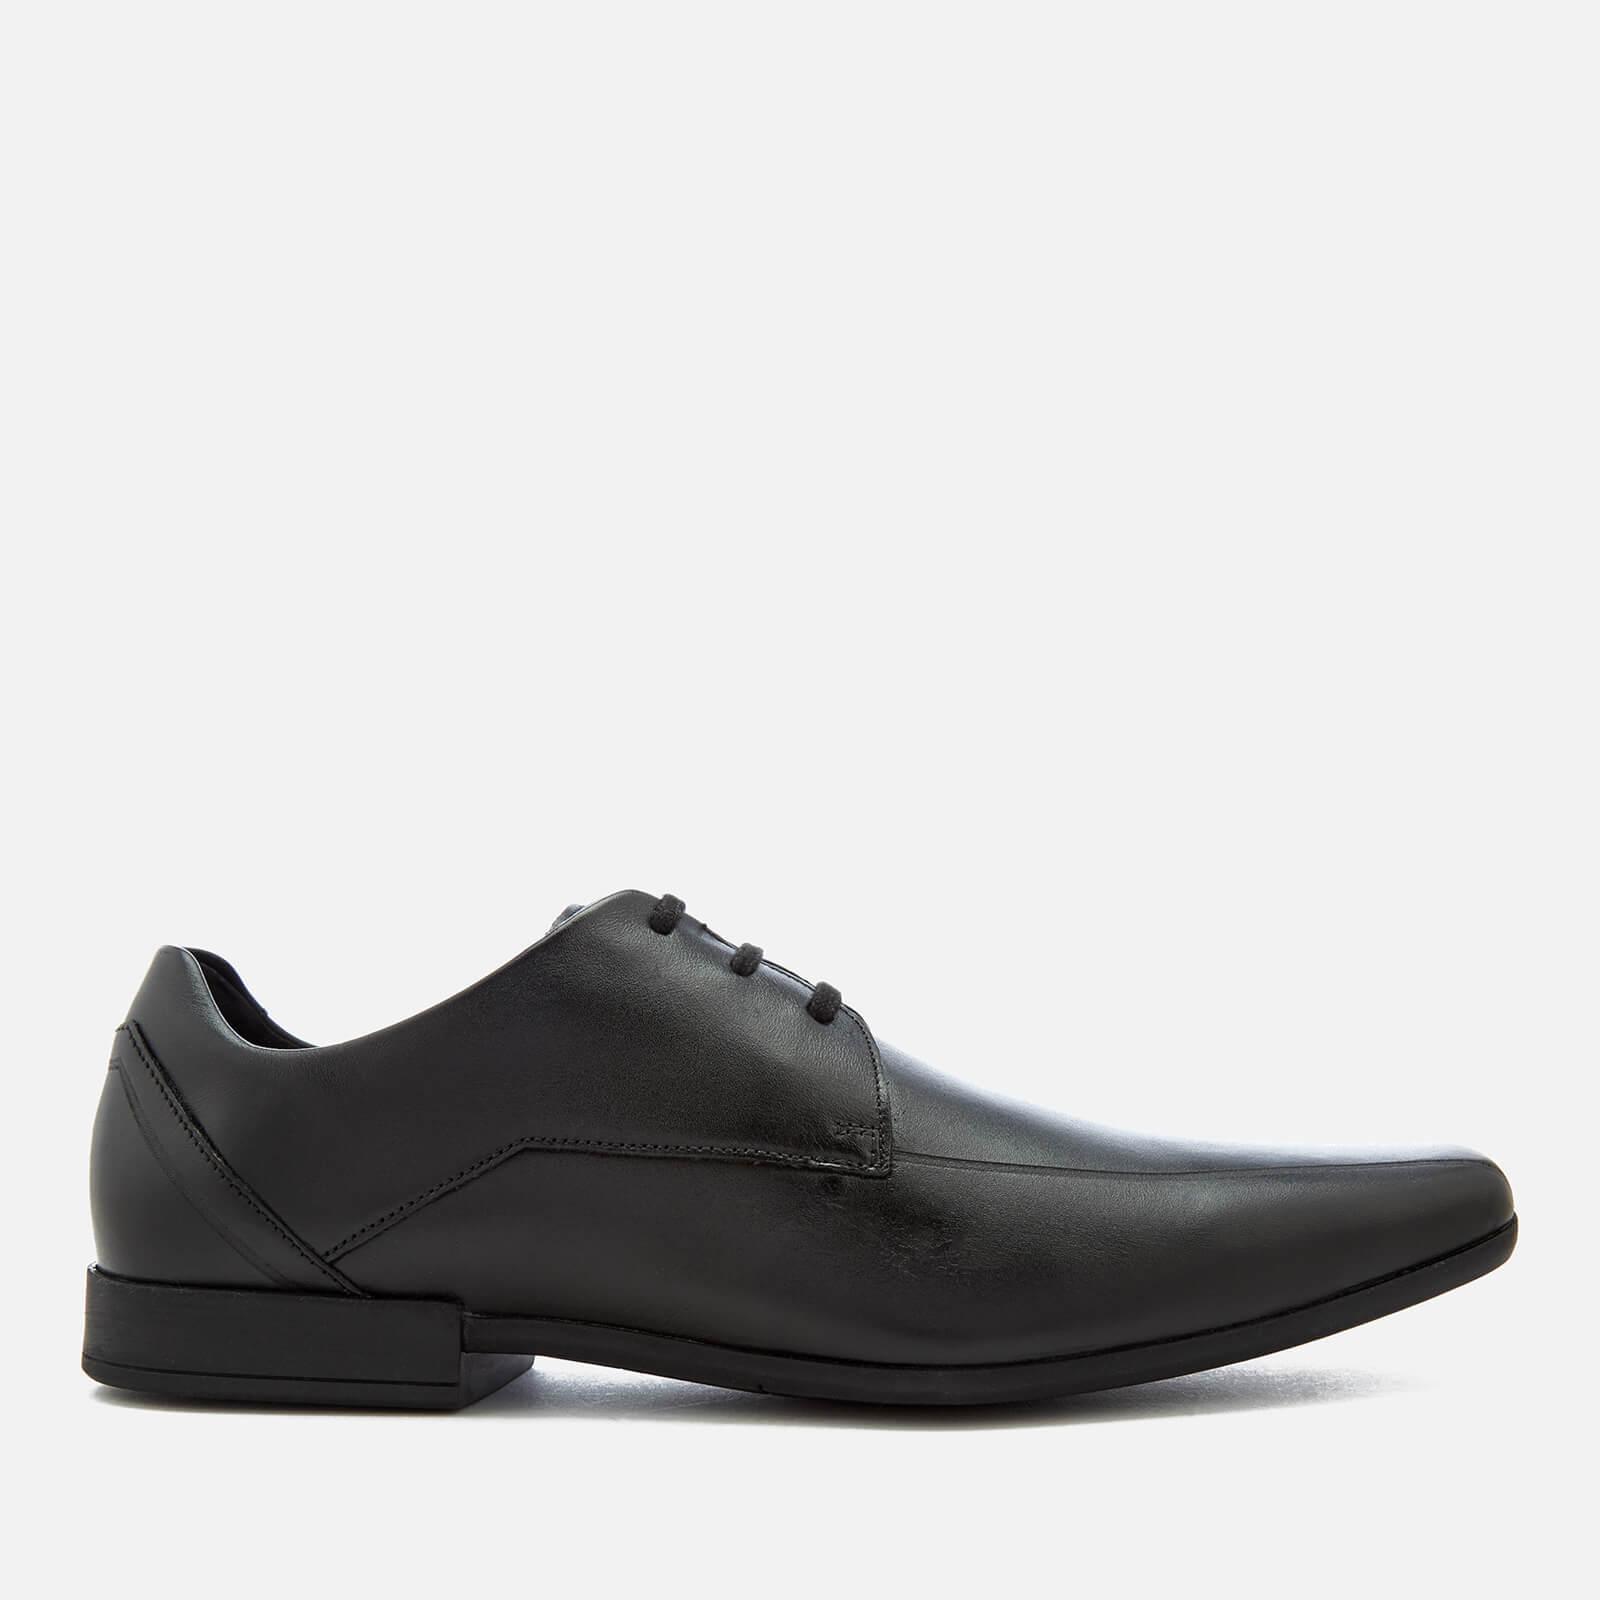 Clarks Men's Glement Over Leather Derby Shoes - Black - UK 11